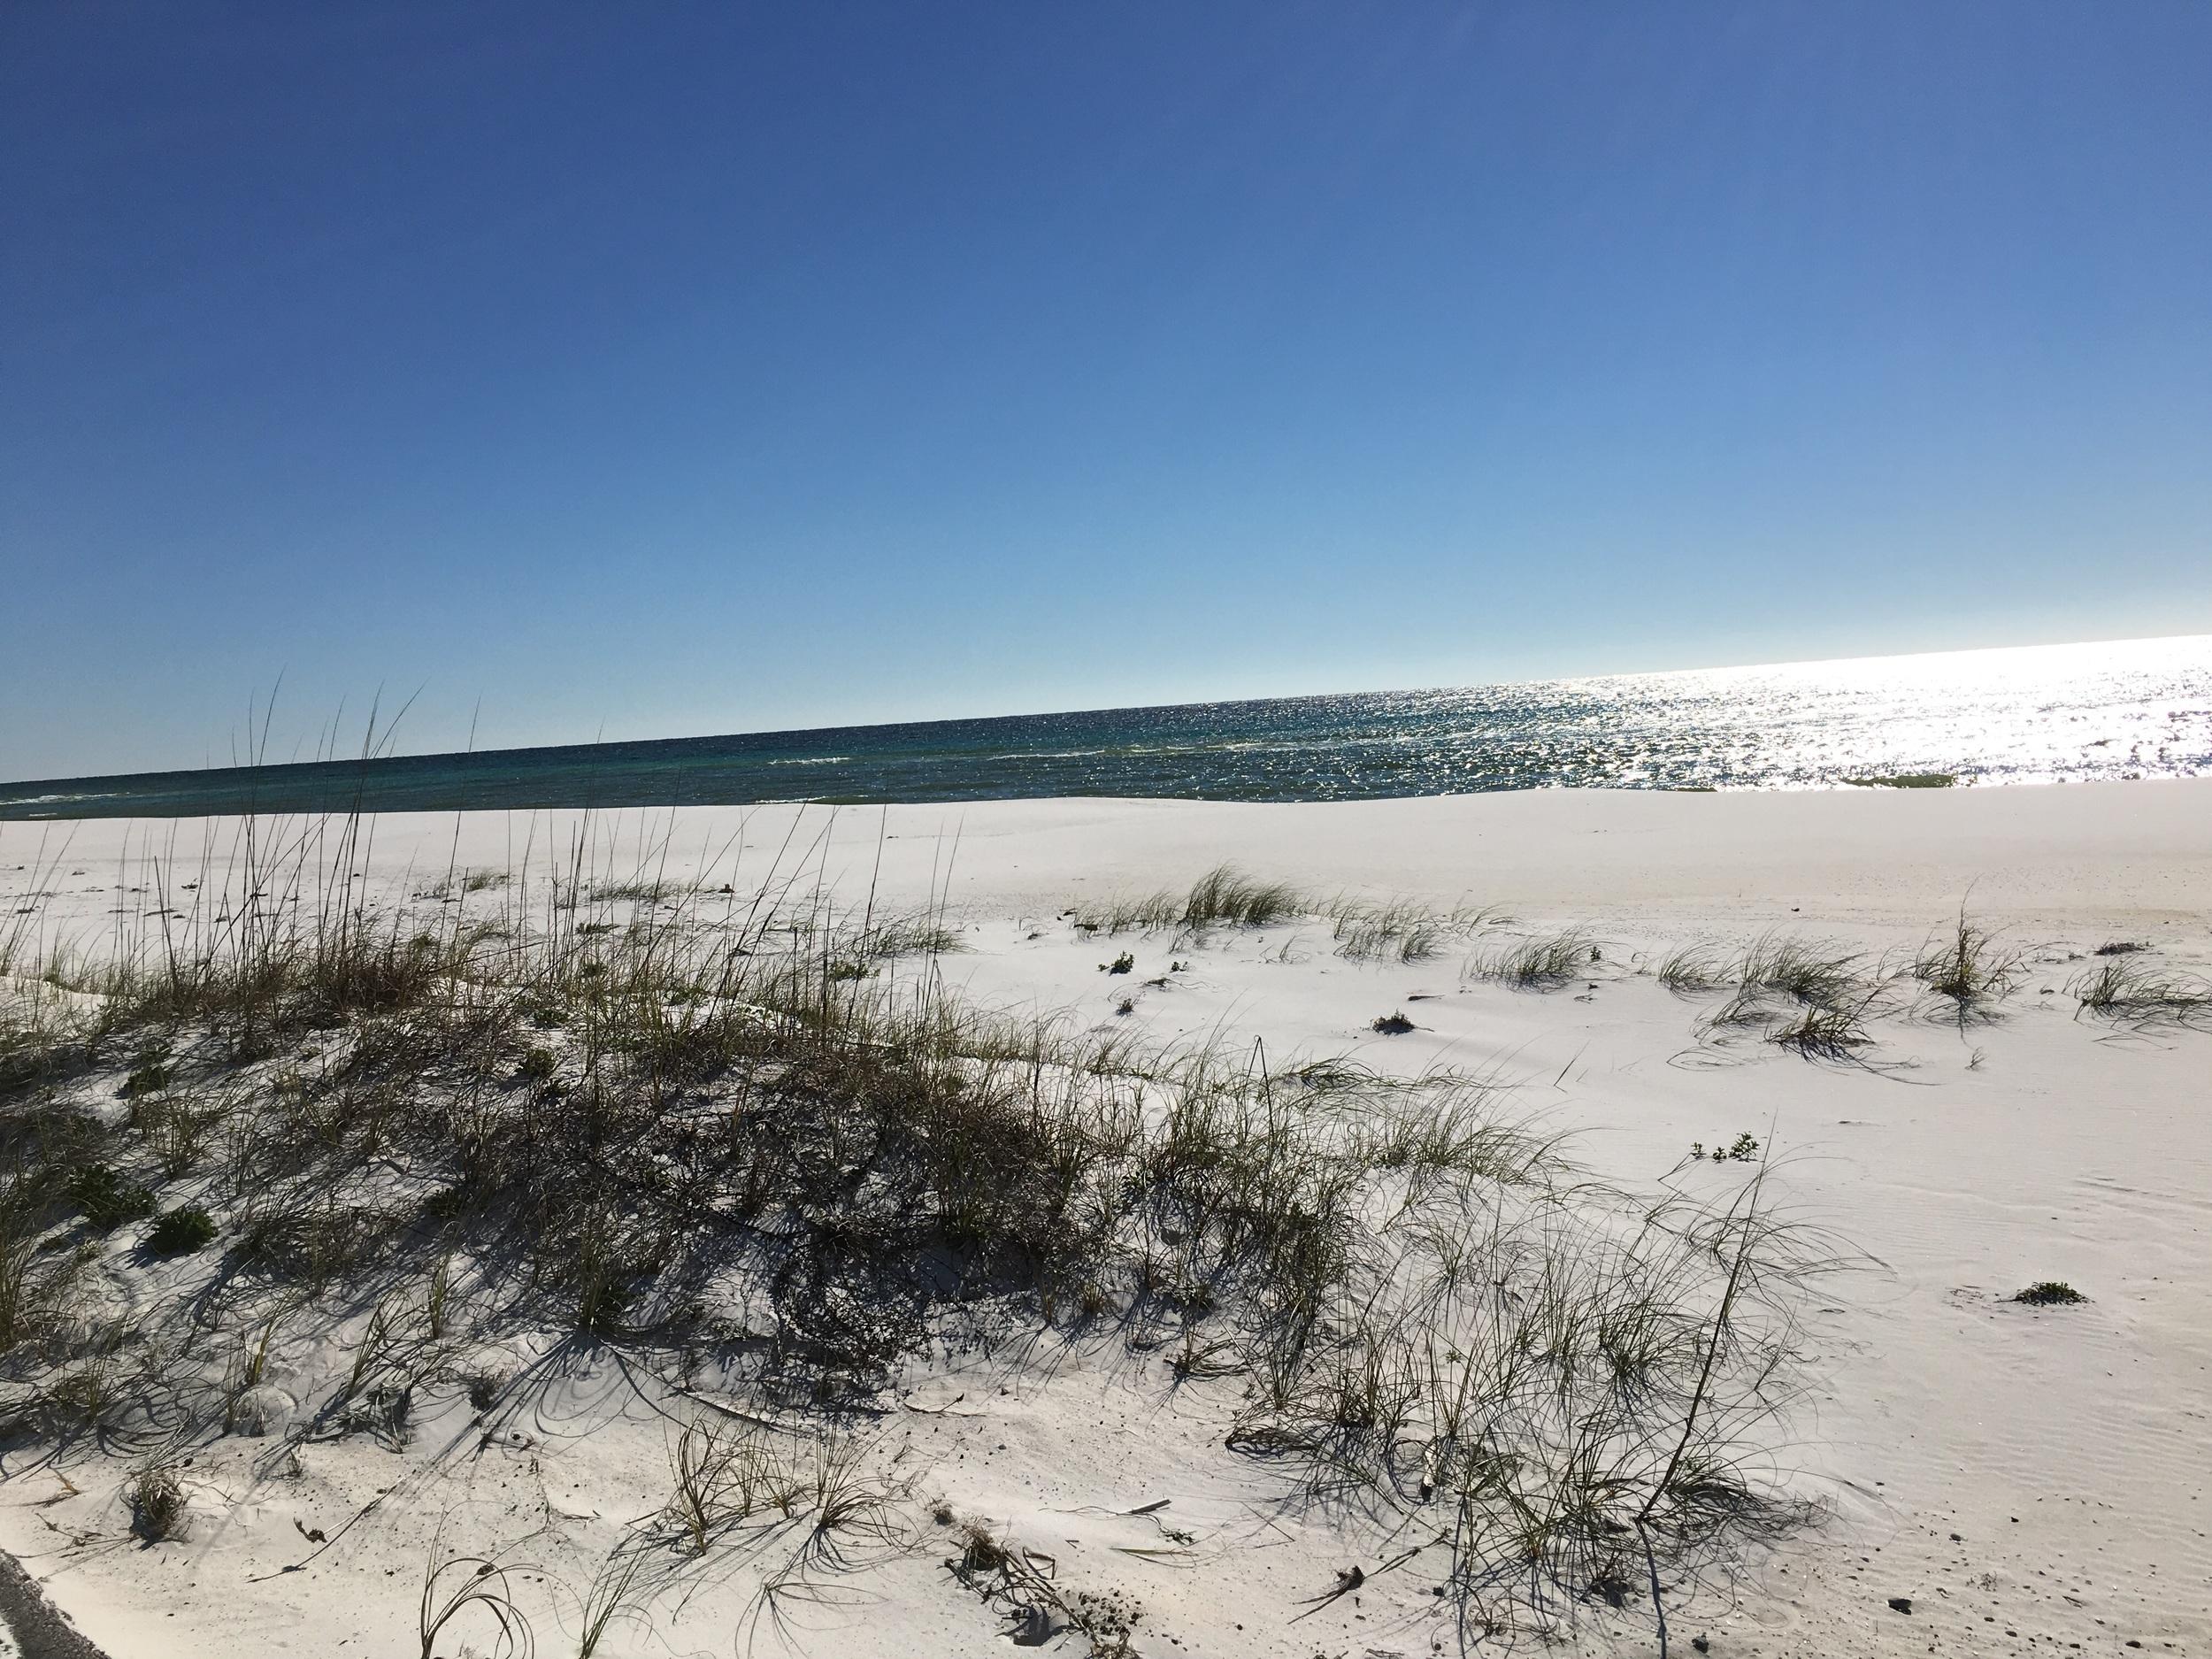 Miles of sand dunes